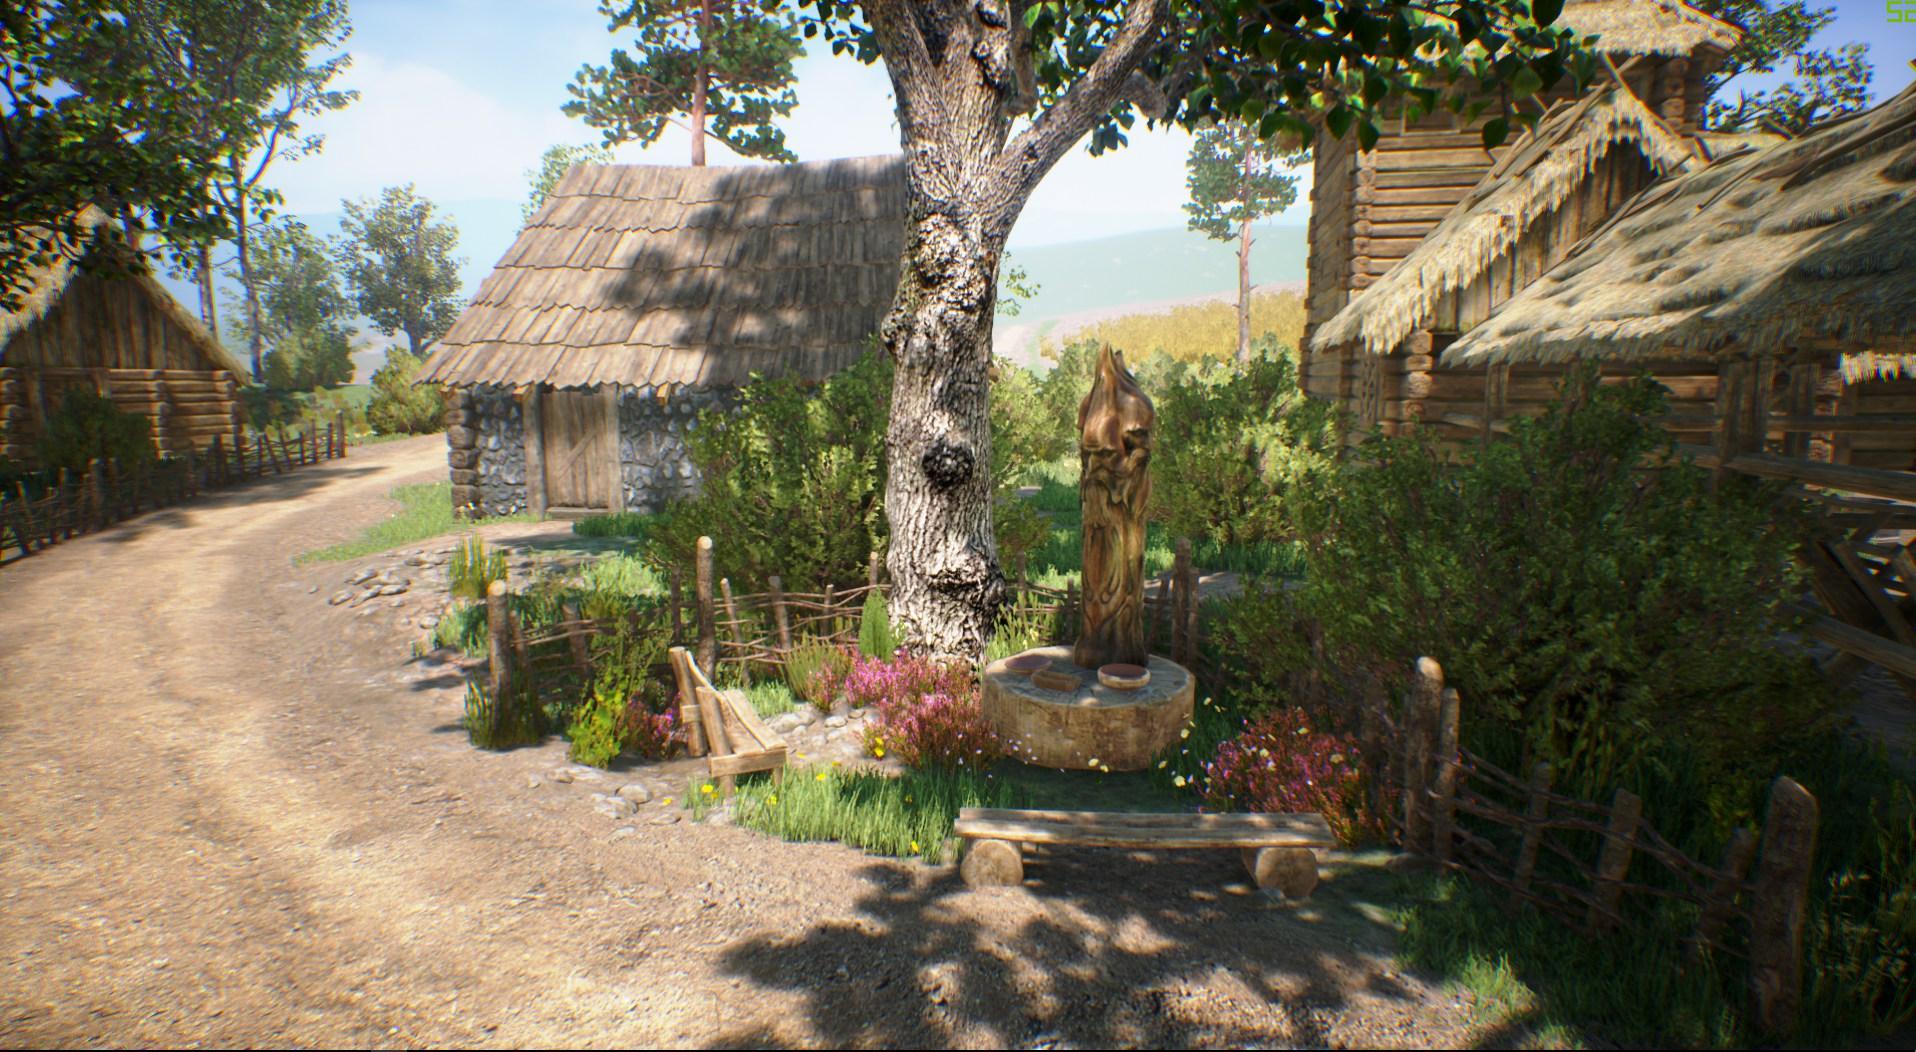 village scene 7.jpg